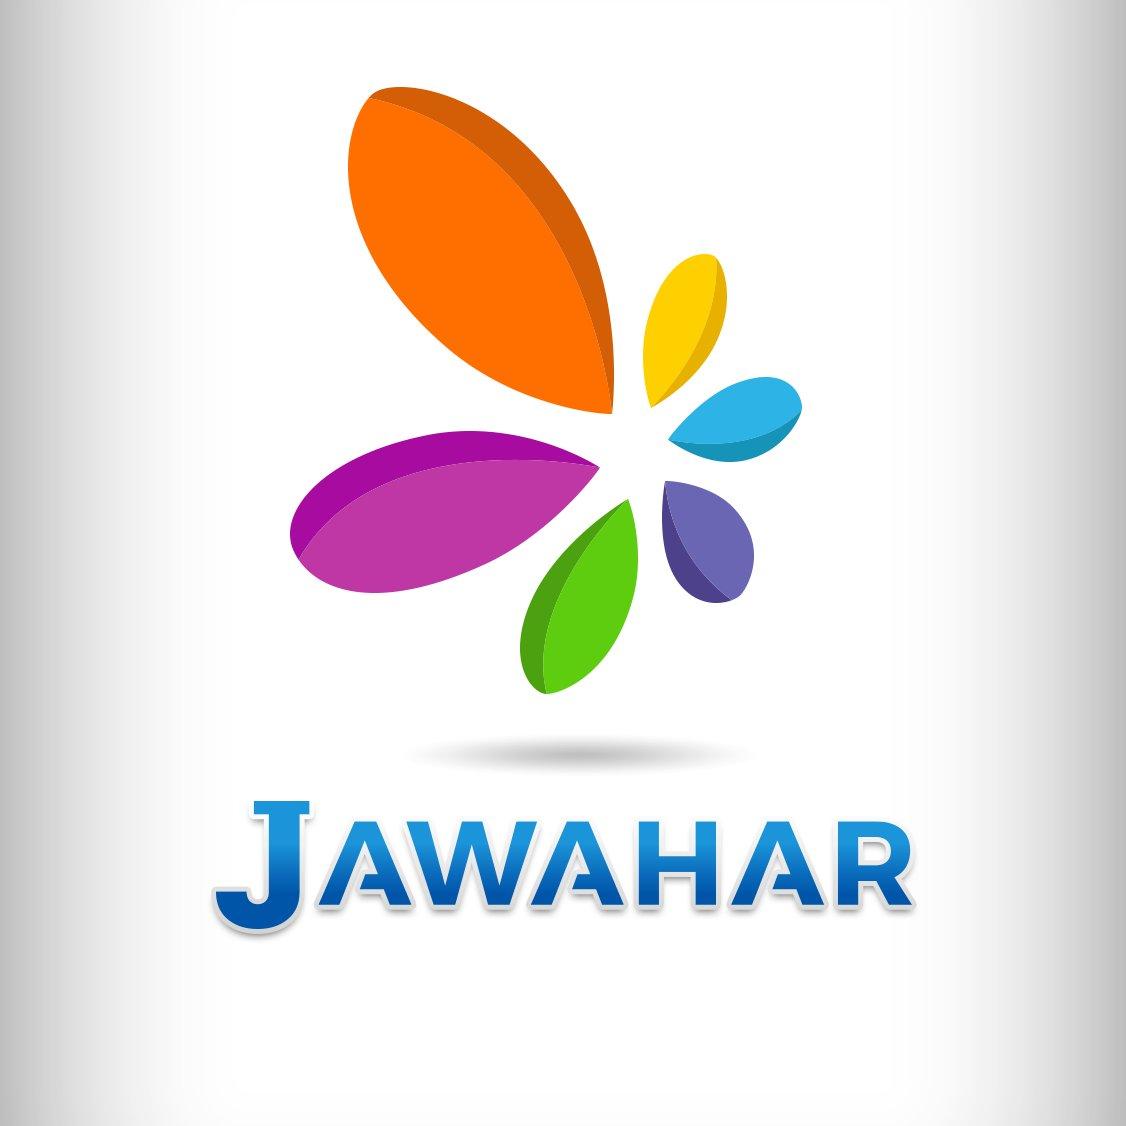 Jawahar Channel on Twitter: